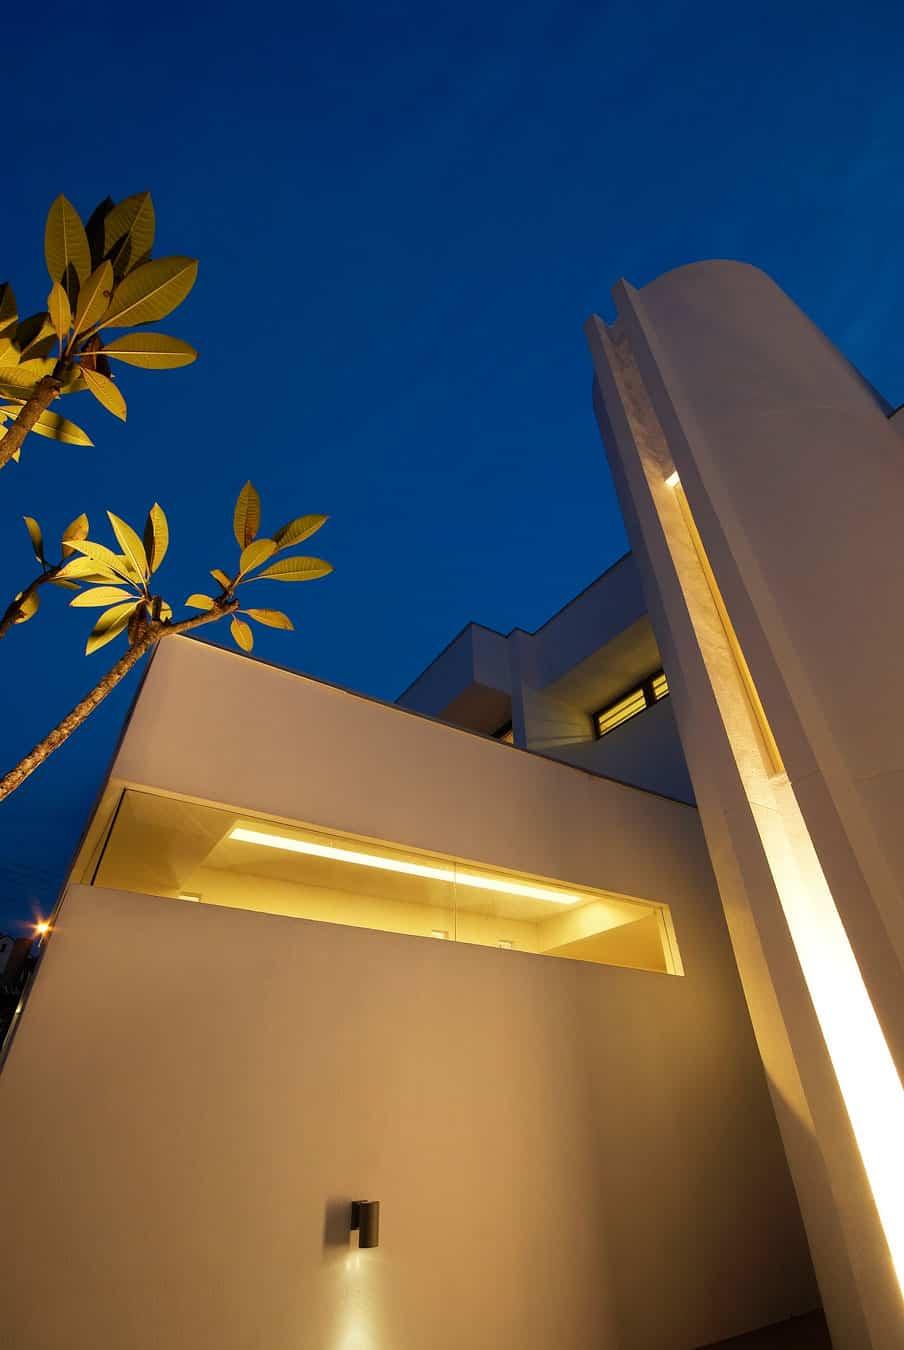 Hillside Bungalow Remodel by Interlink Design Solutions (25)